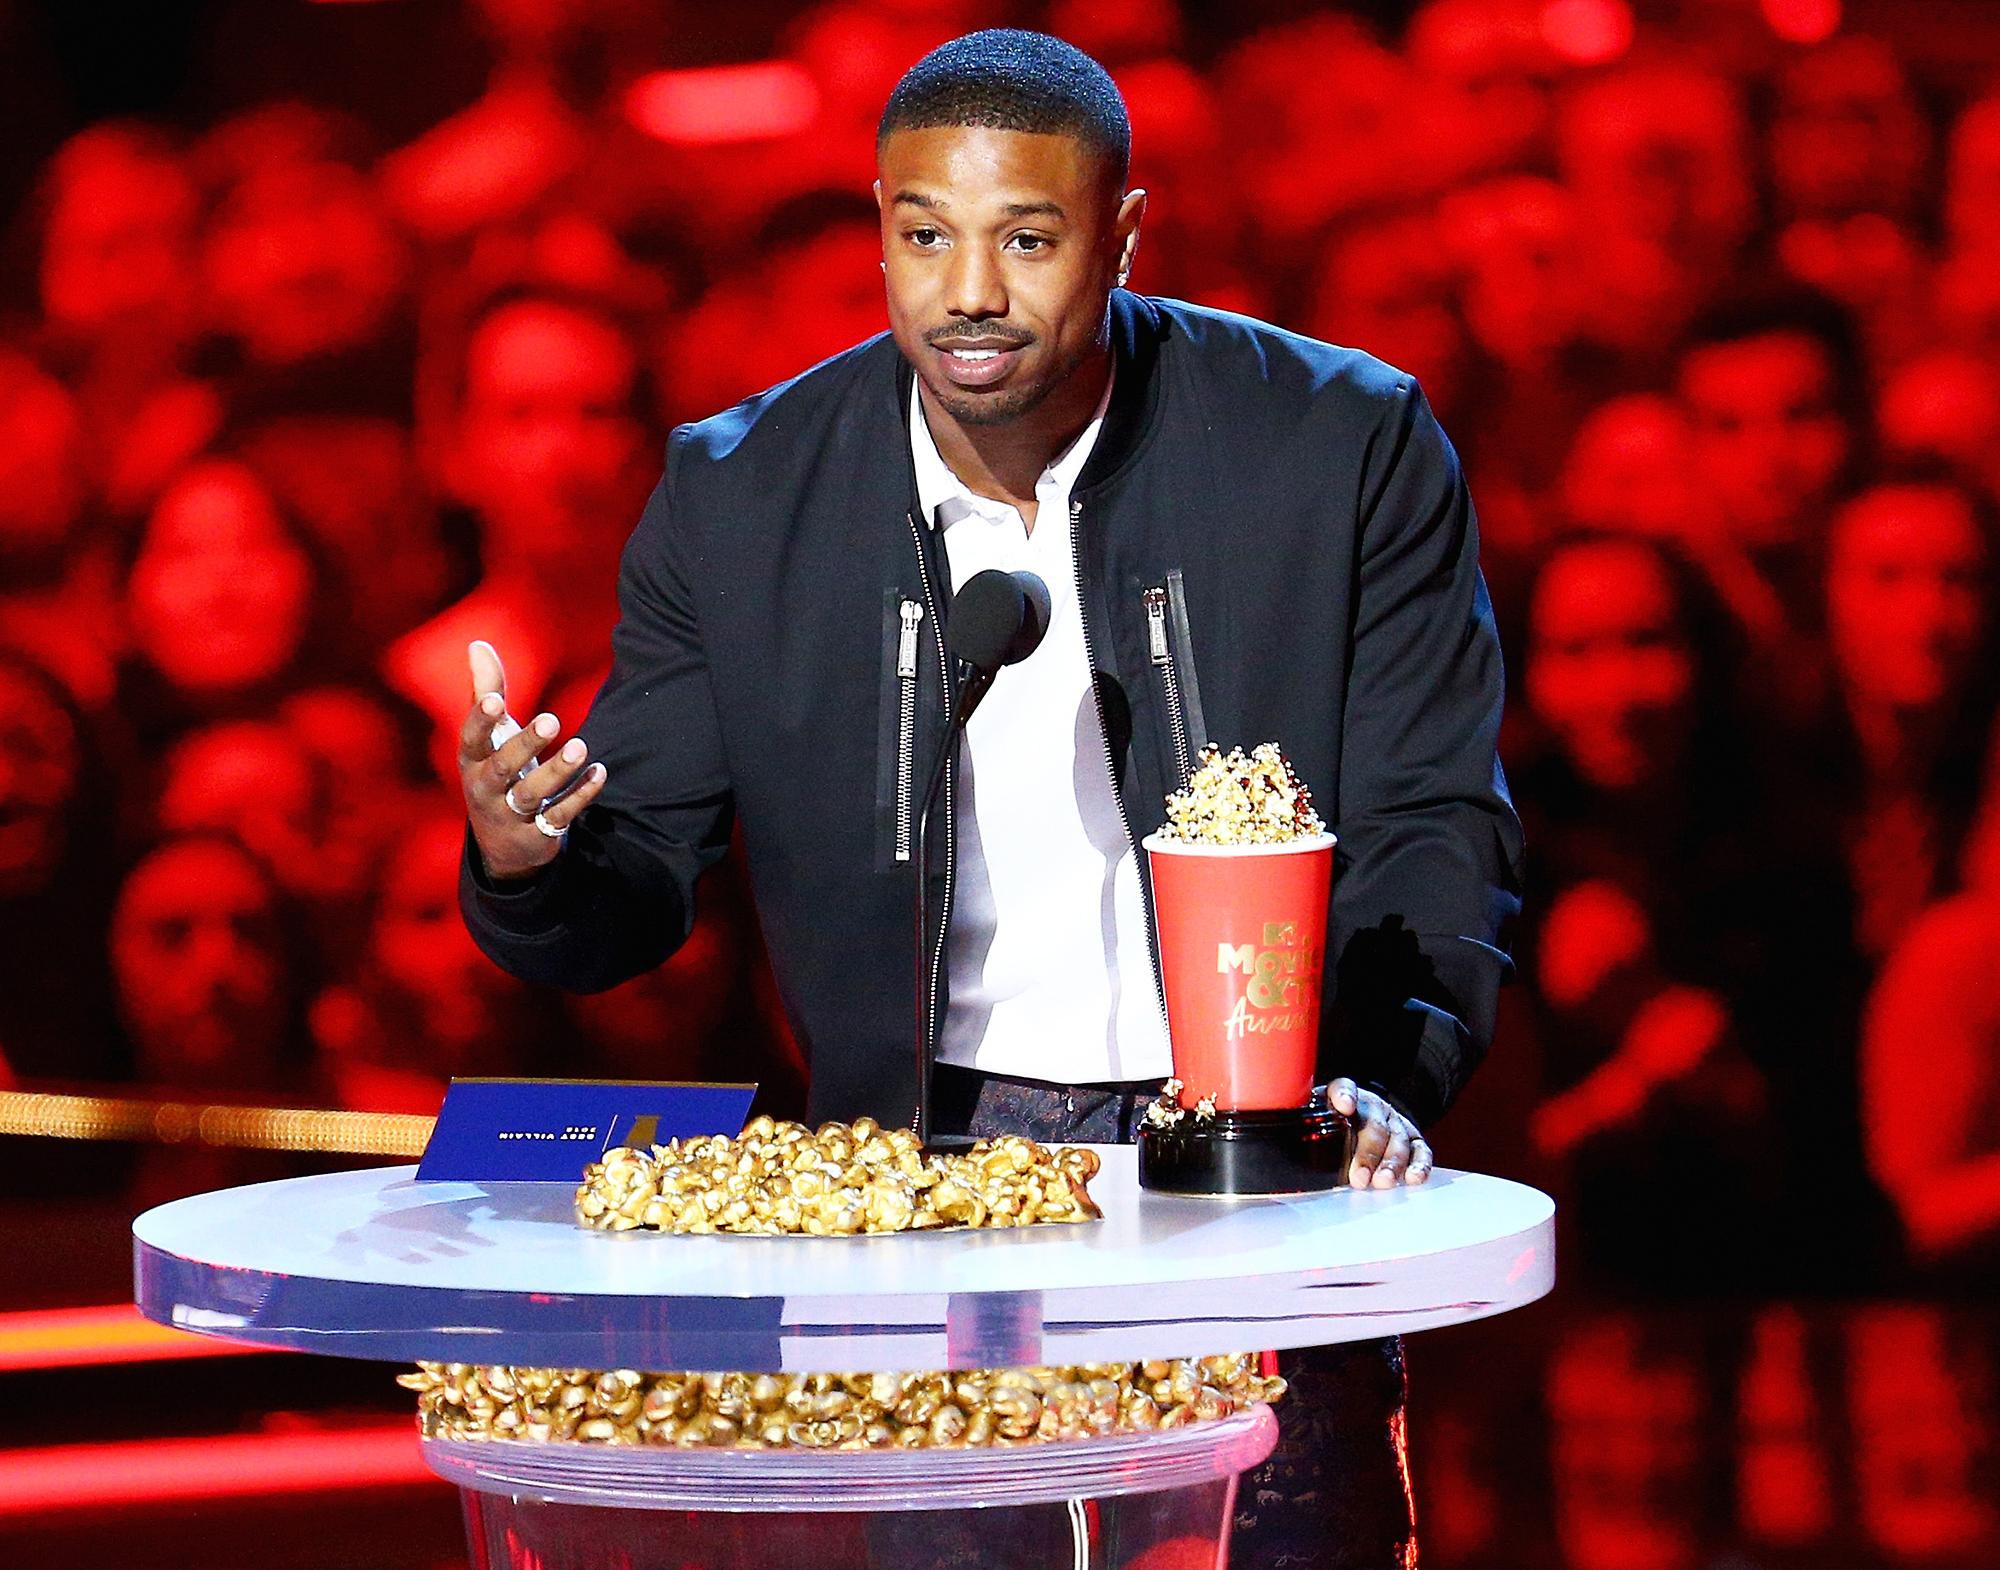 Michael B. Jordan Slams Roseanne MTV Movie Awards 2018